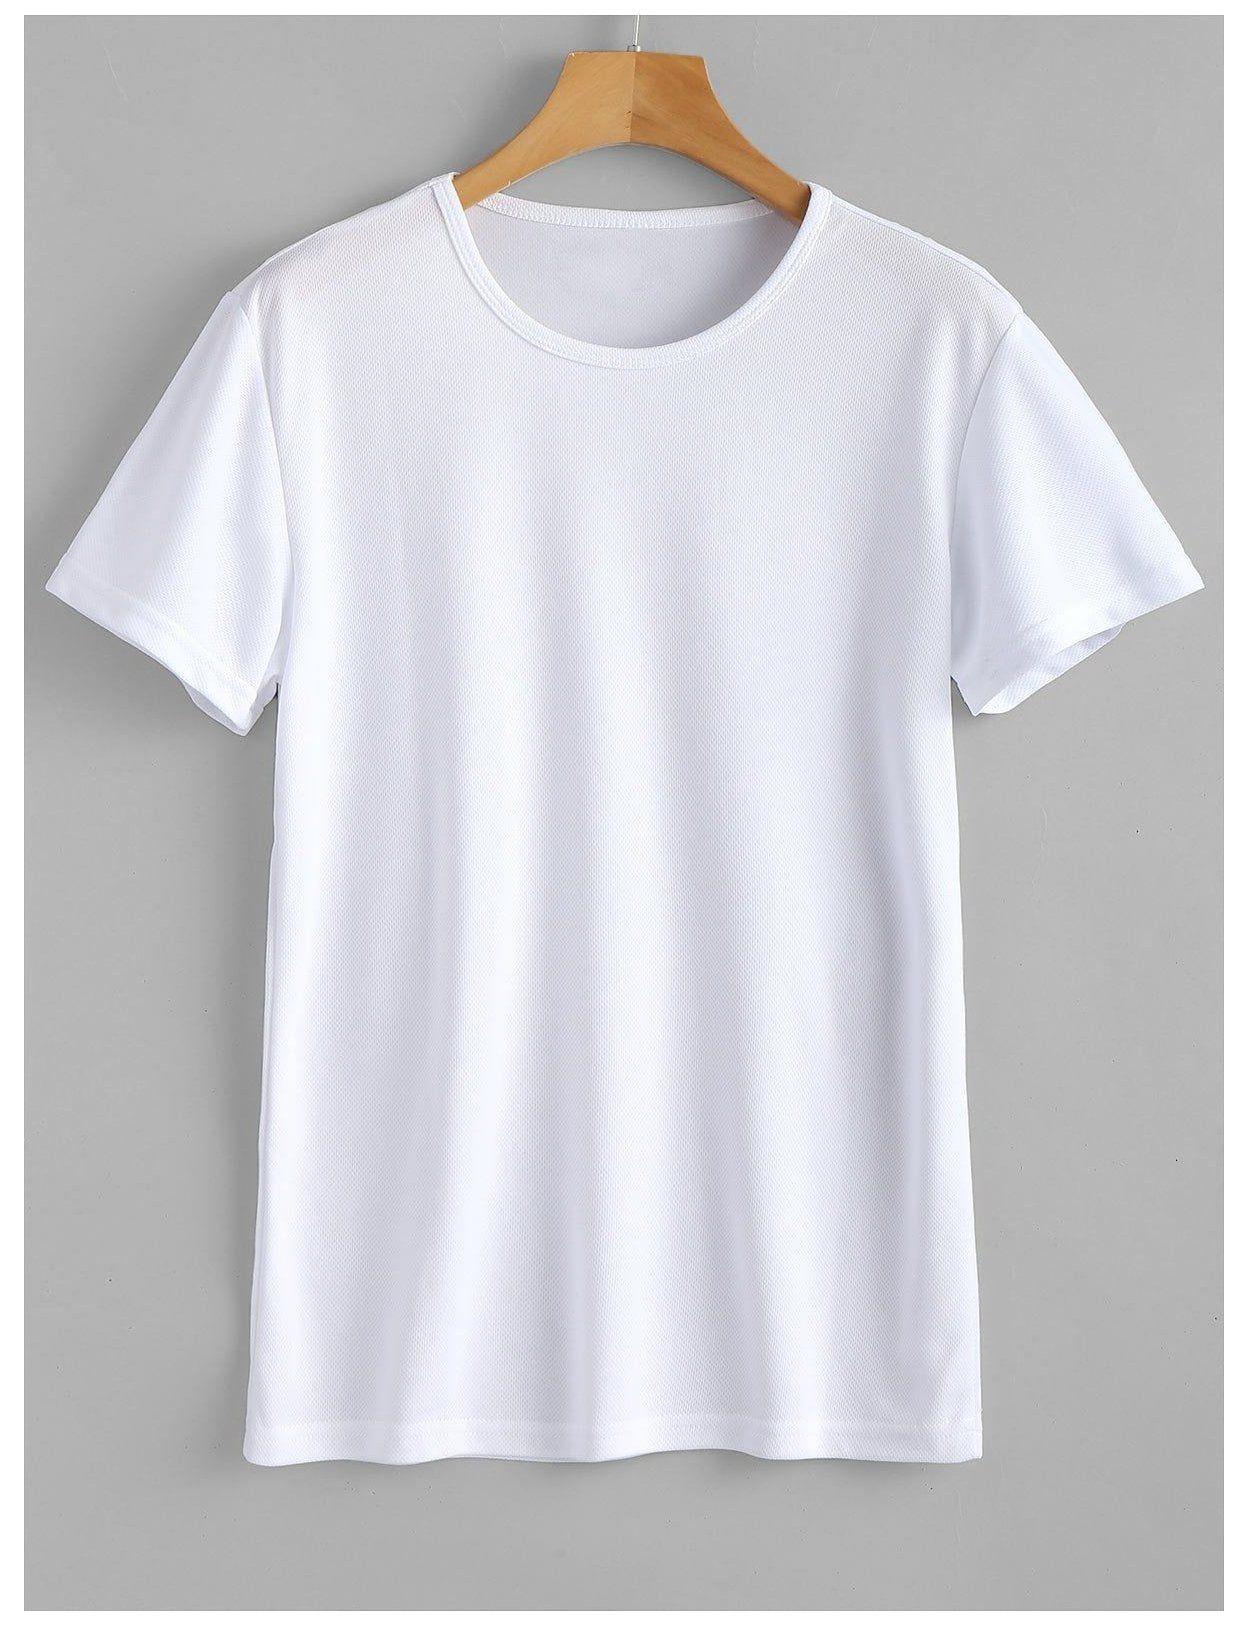 Workout T Shirt Tank Top For Women Plane White T Shirts Waterproof Eyelet Sport T Shirt Black White Affiliate Desain Kaos Oblong Baju Kaos Baju Sweter